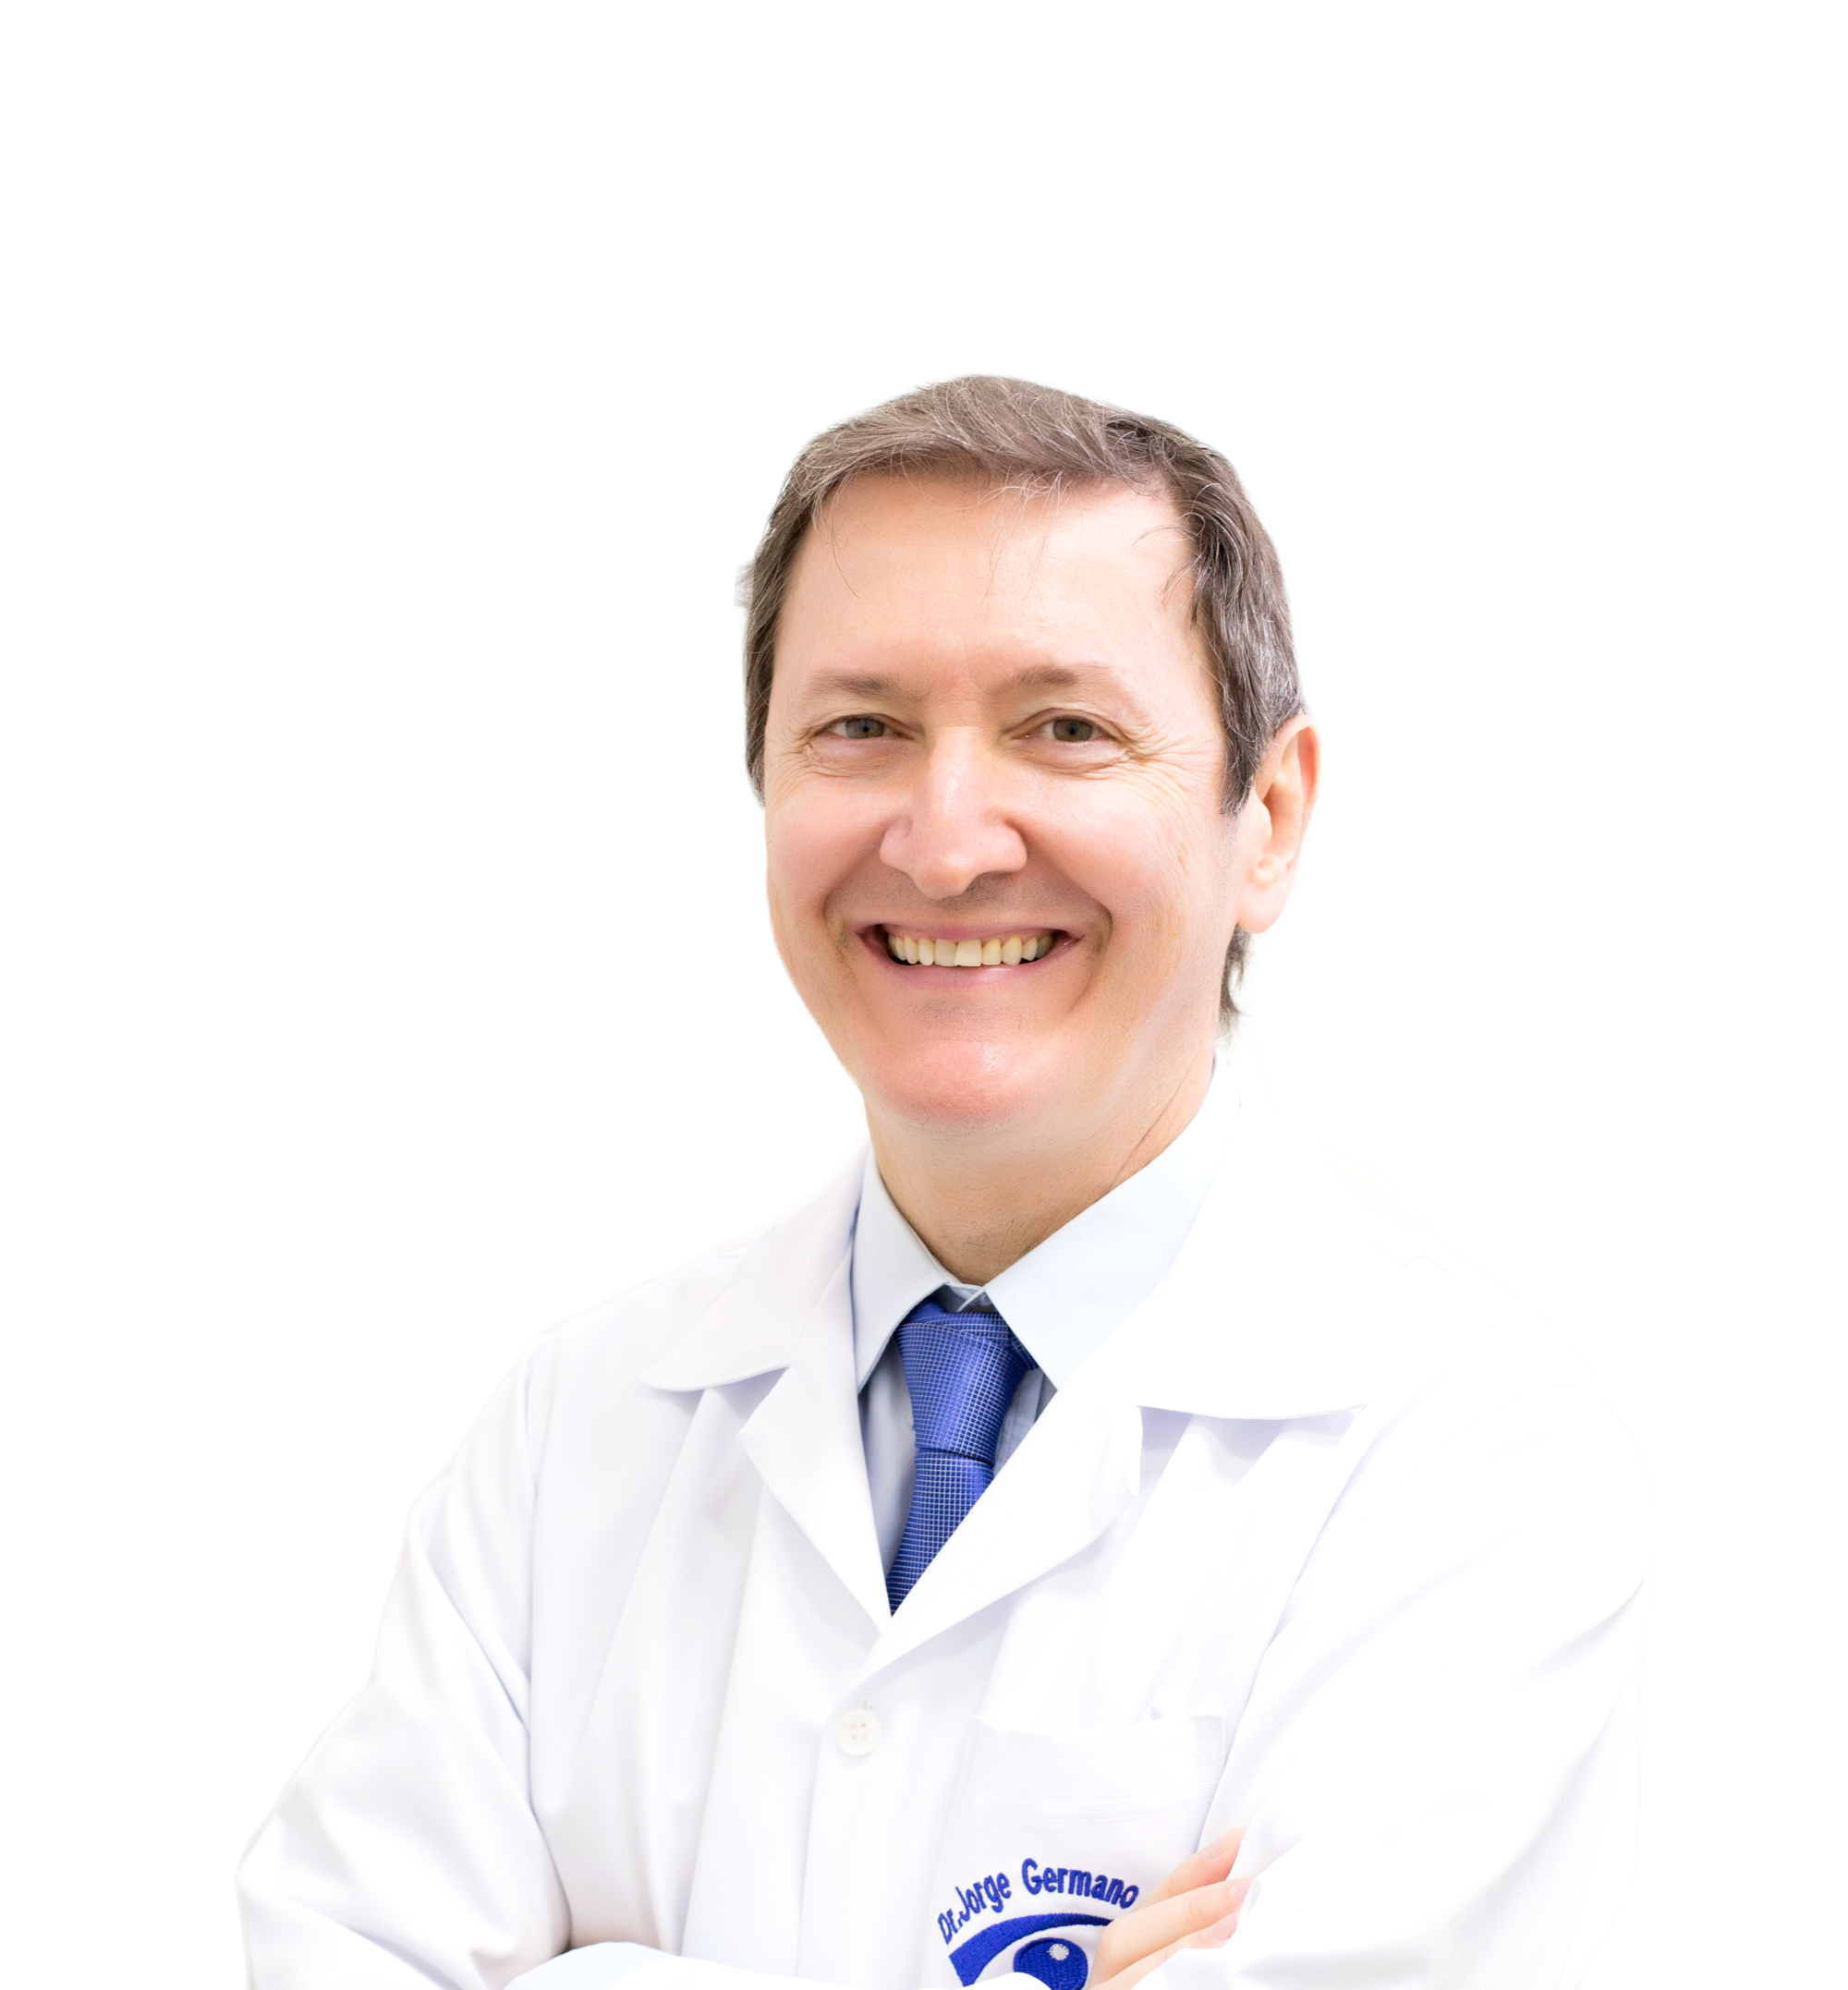 Agendamento online Dr Jorge Germano